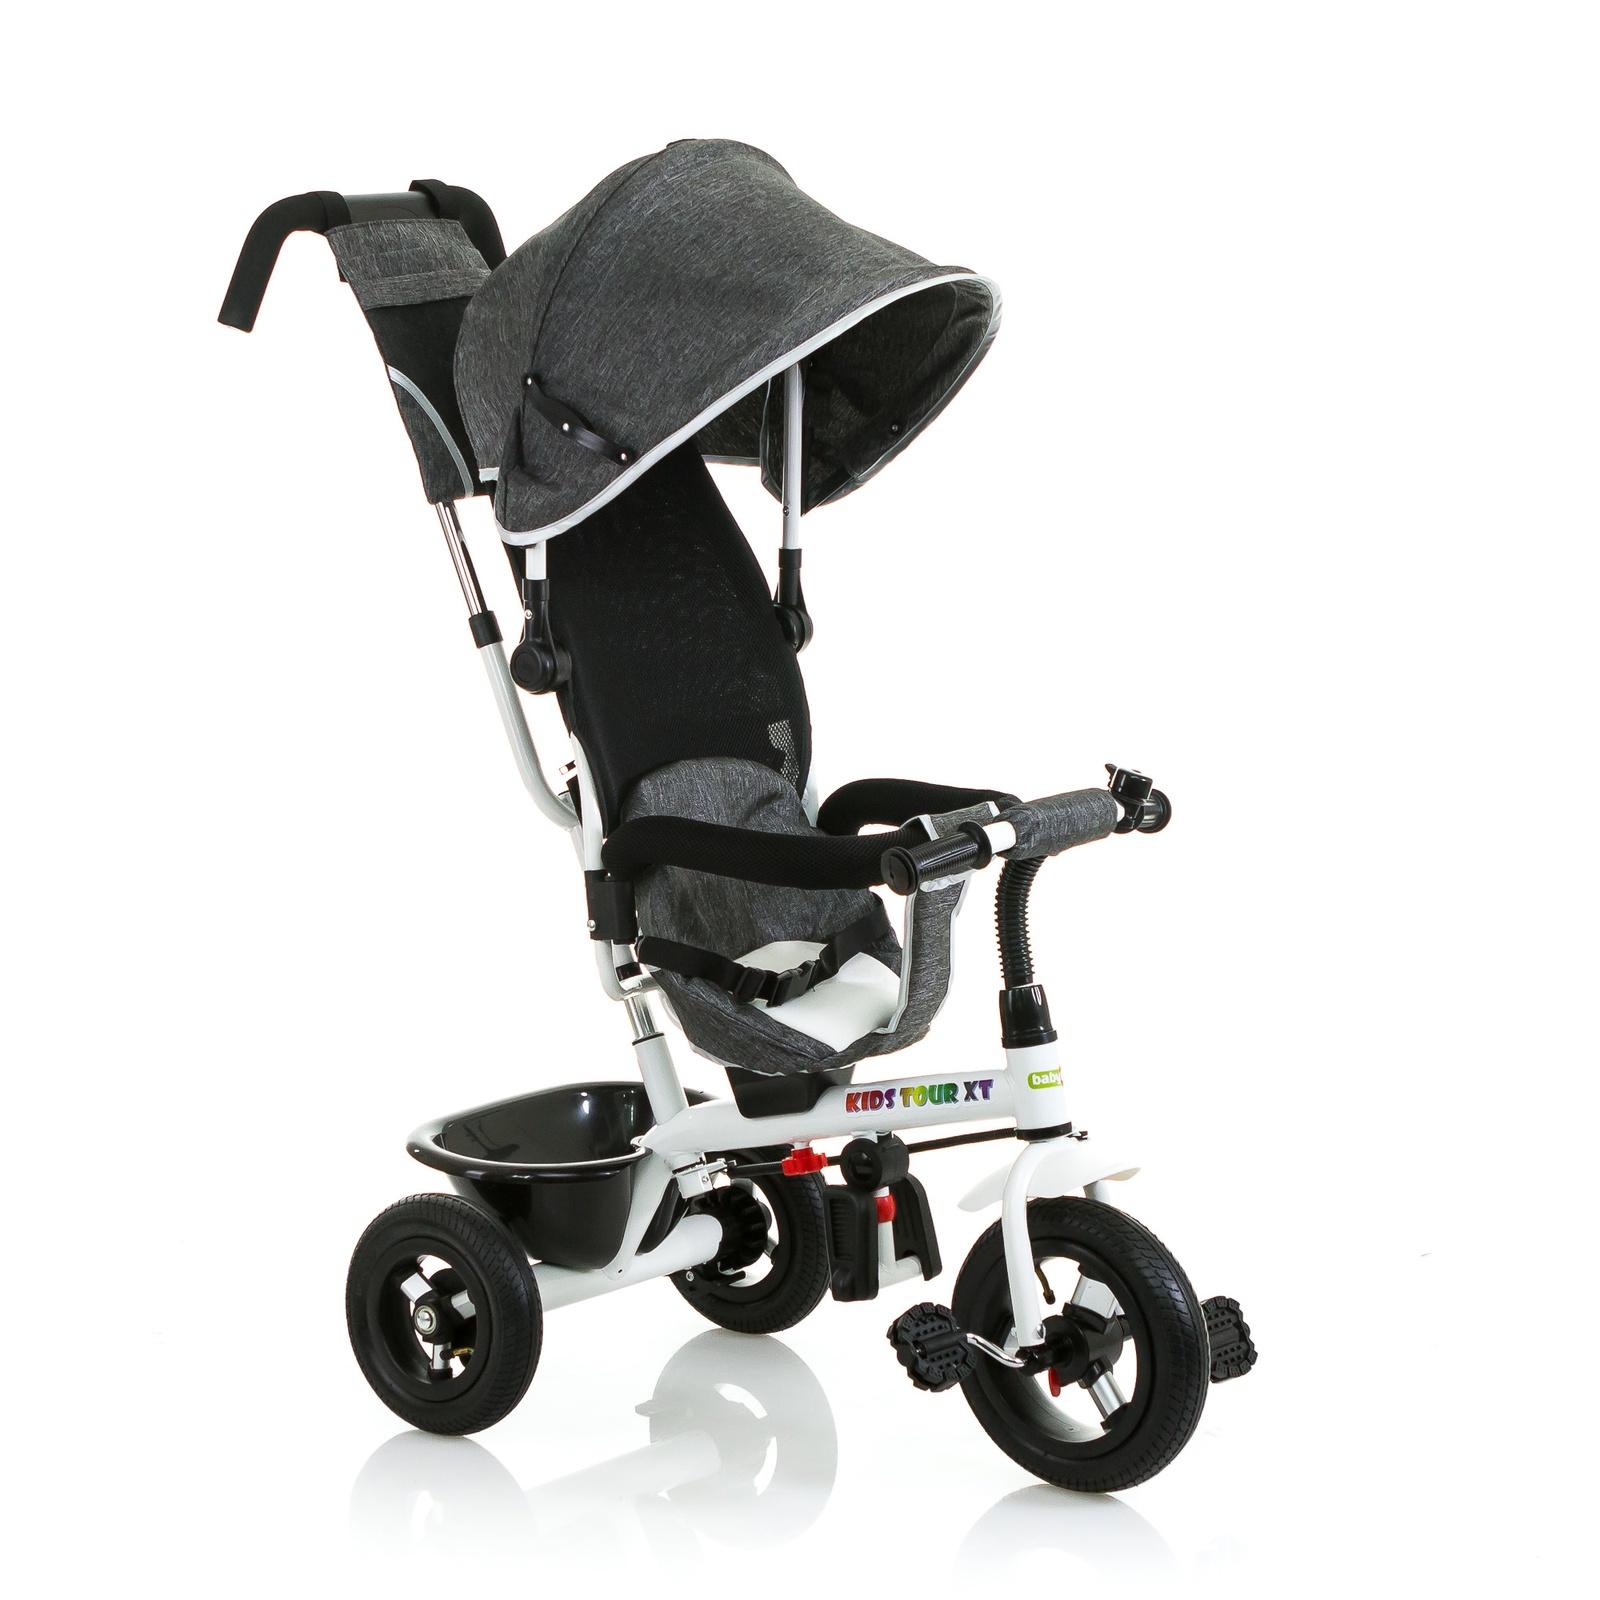 Велосипед BabyHit Kids Tour XT, серый цена